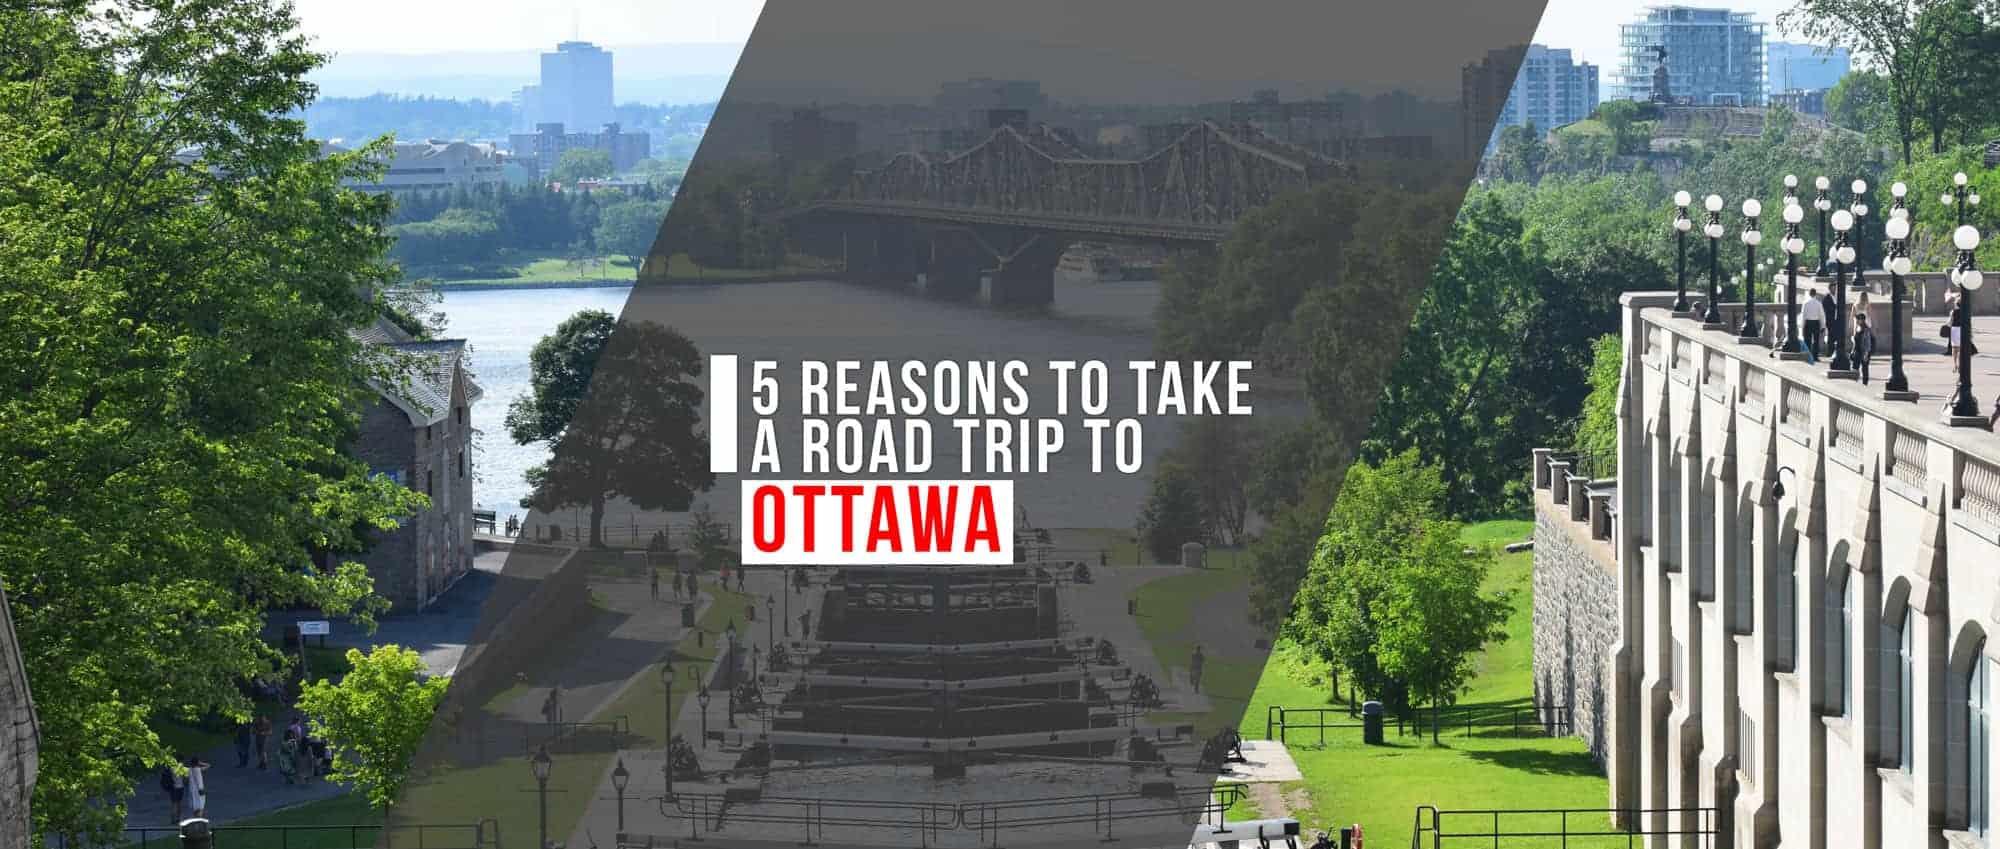 5 Reasons to Take a Road Trip to Ottawa